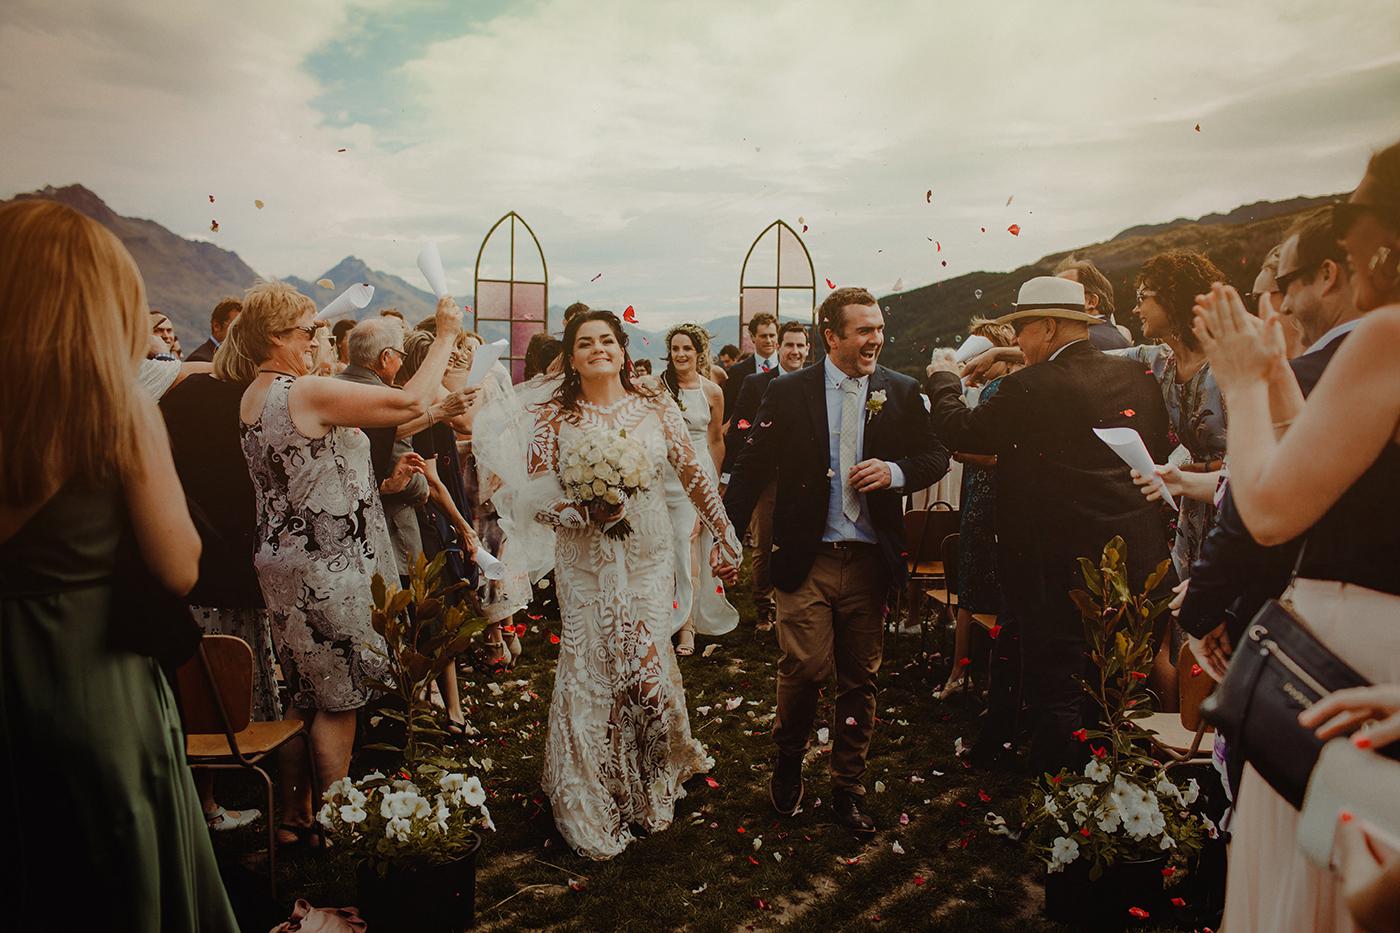 queenstownwedding (2).jpg